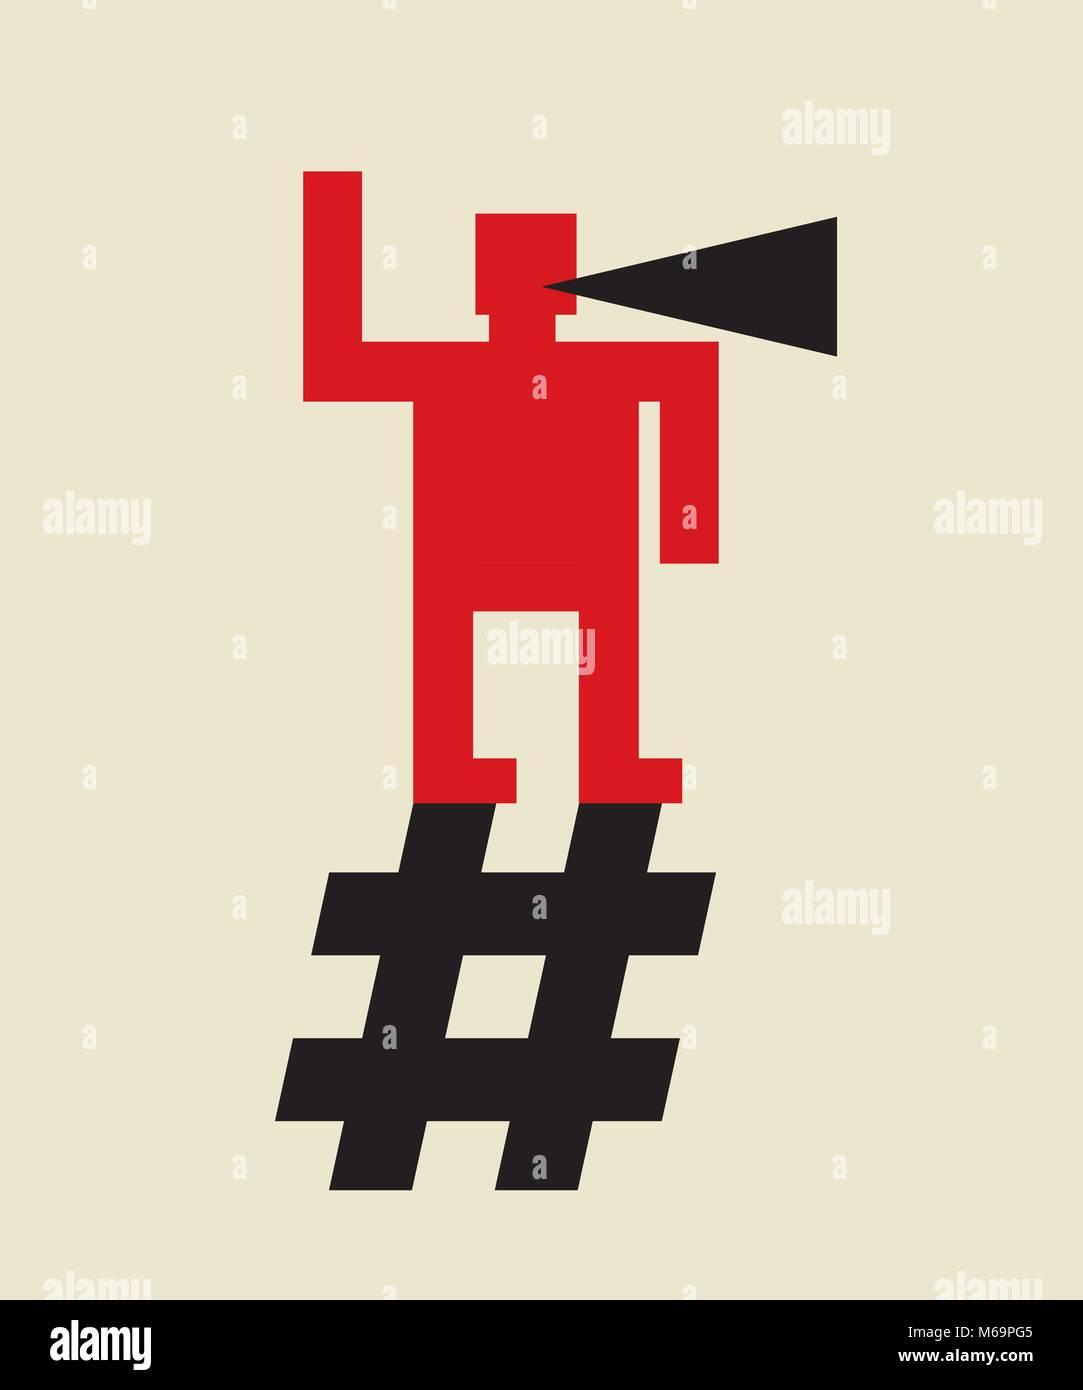 online propaganda: spread the word using hashtag, - Stock Vector